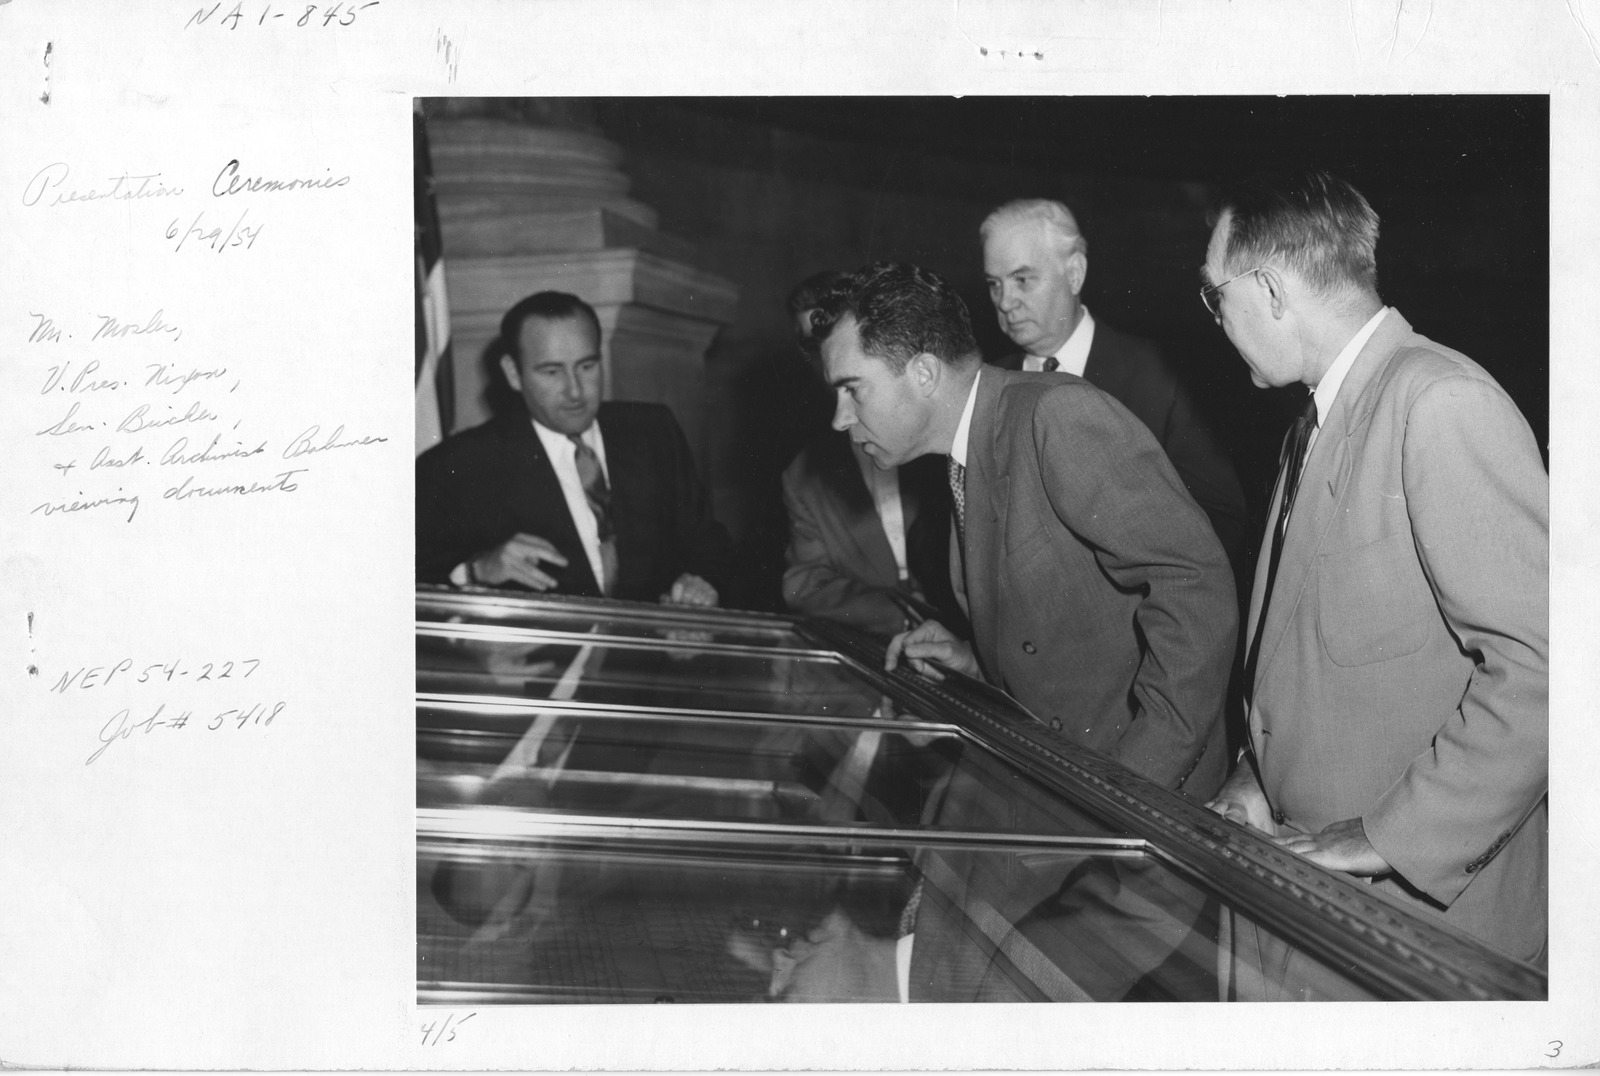 Photograph of Presentation Ceremonies, Mr. Mosler, Vice President Richard Nixon, Senator Bricker, and Assistant Archivist Bahmer Viewing Documents